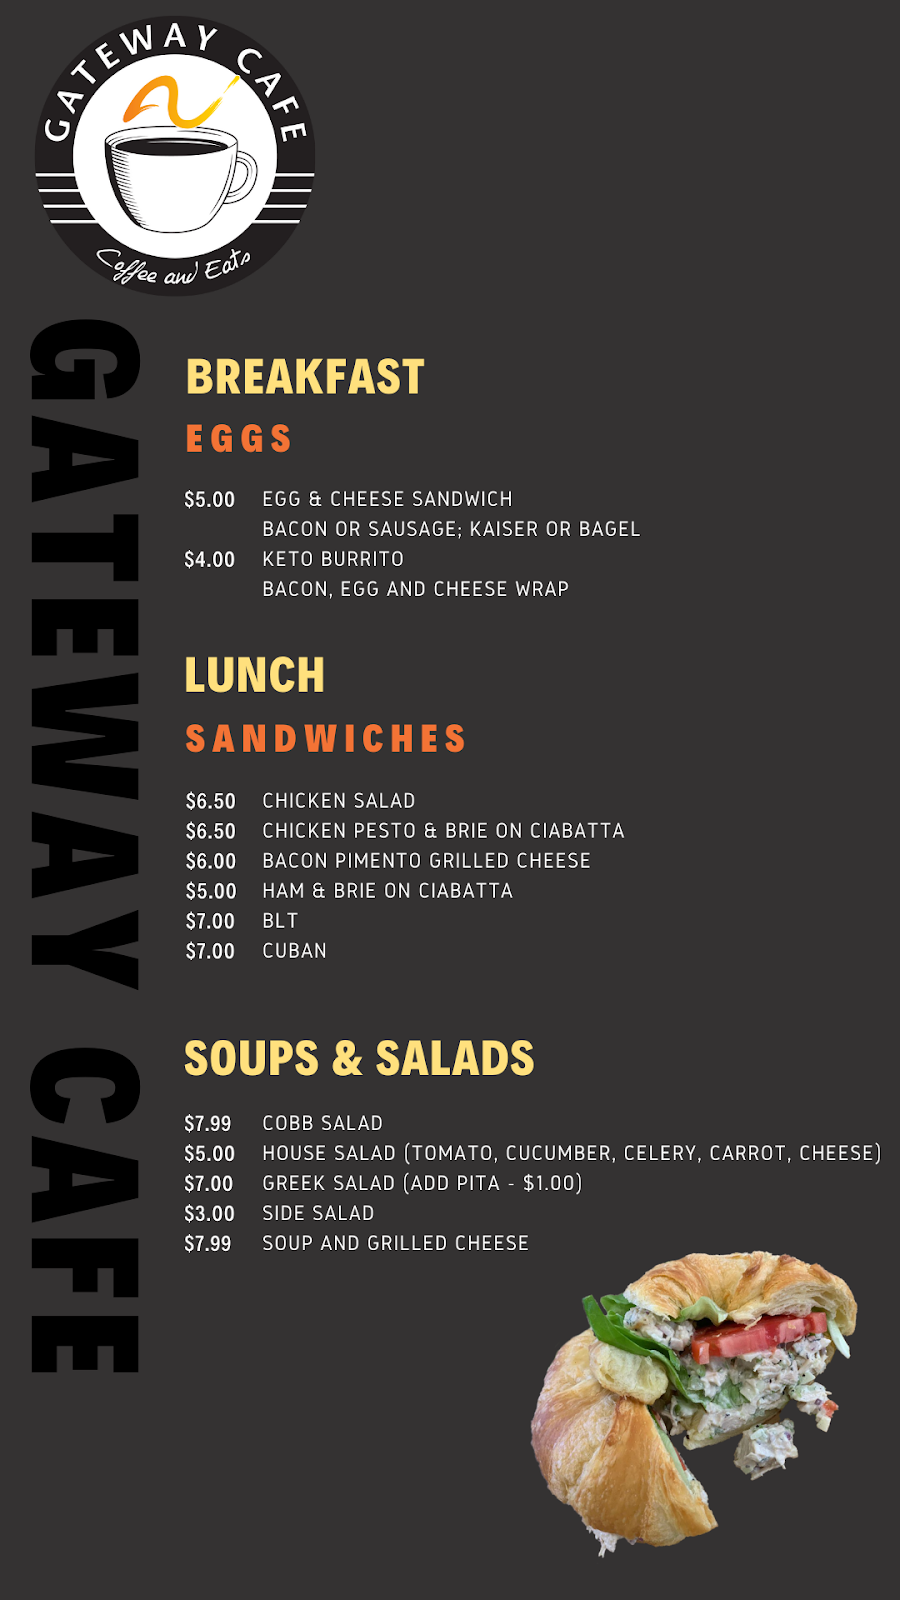 Gateway Cafe | bakery | 220 W Garden St Suite 130, Pensacola, FL 32502, USA | 8508578600 OR +1 850-857-8600